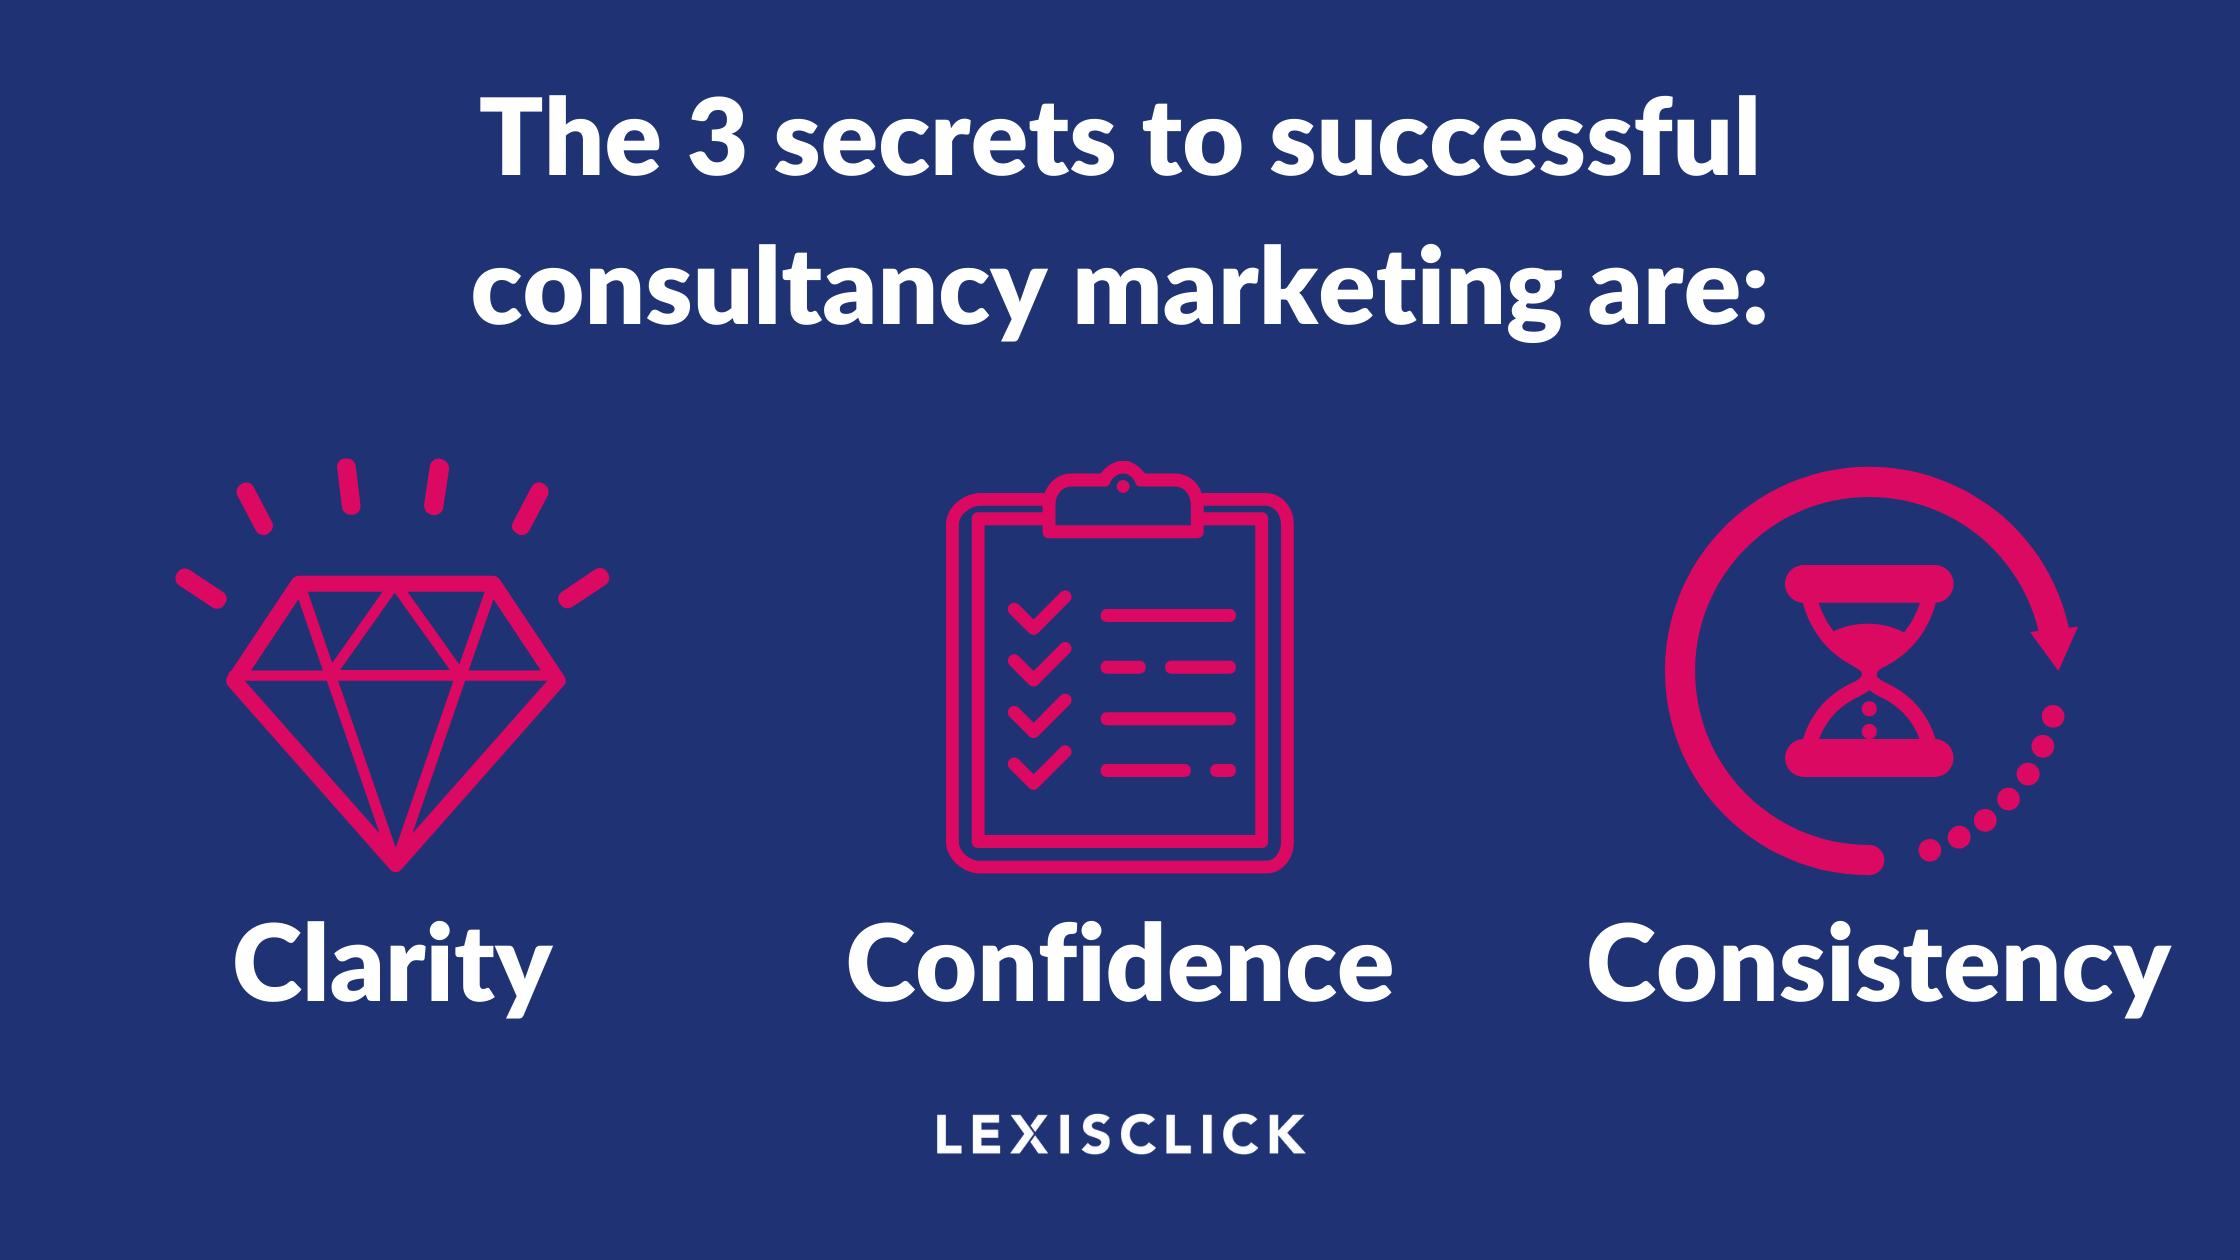 The 3 secrets to successful consultancy marketing are: